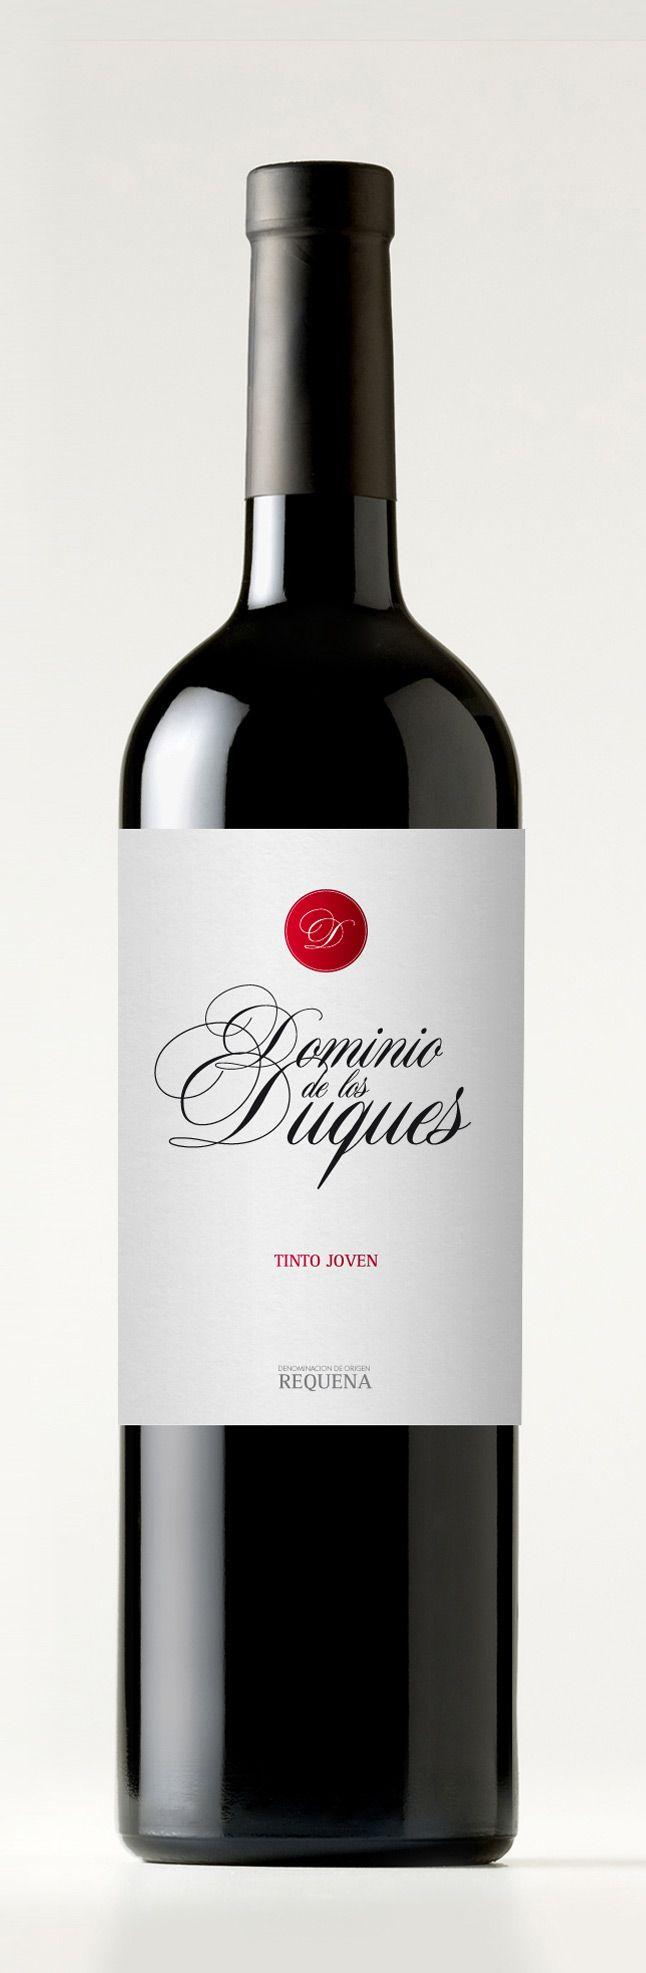 Dise o de las etiquetas para las variedades de vino - Diseno de bodegas ...